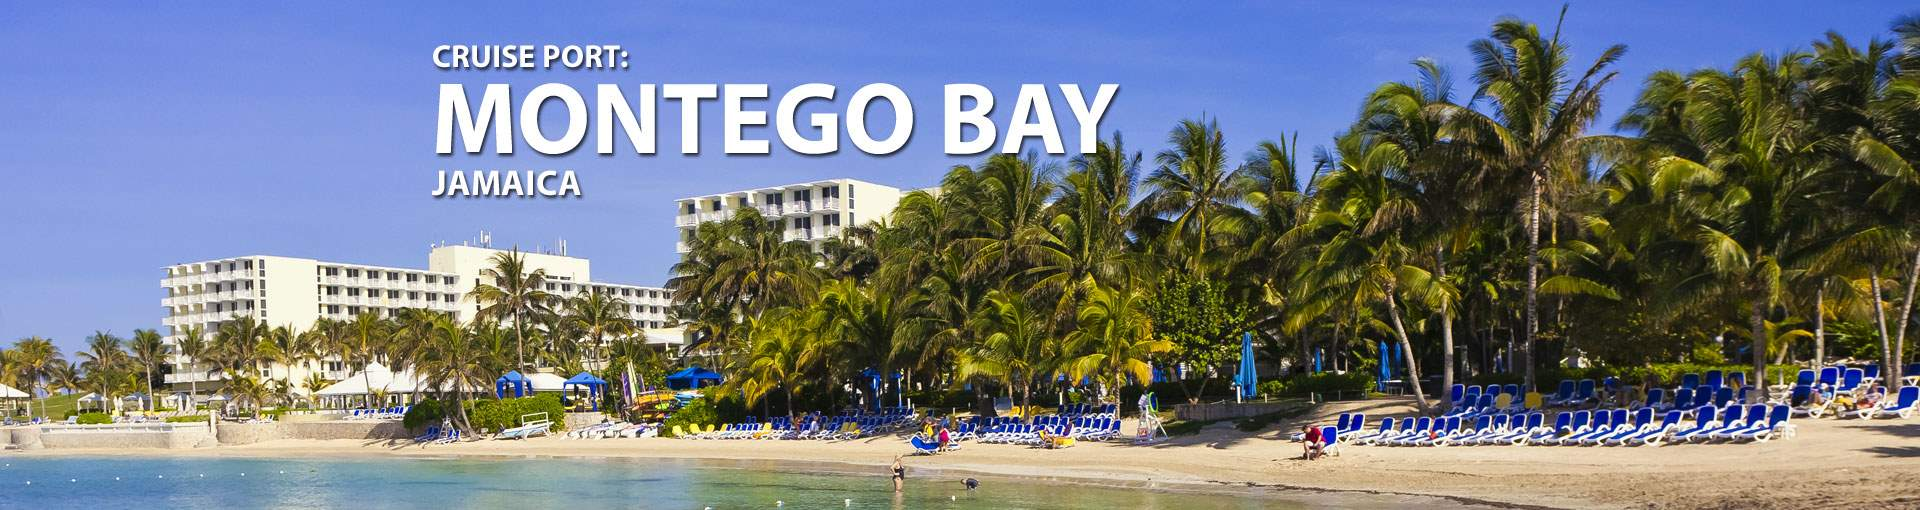 Cruises to Montego Bay, Jamaica